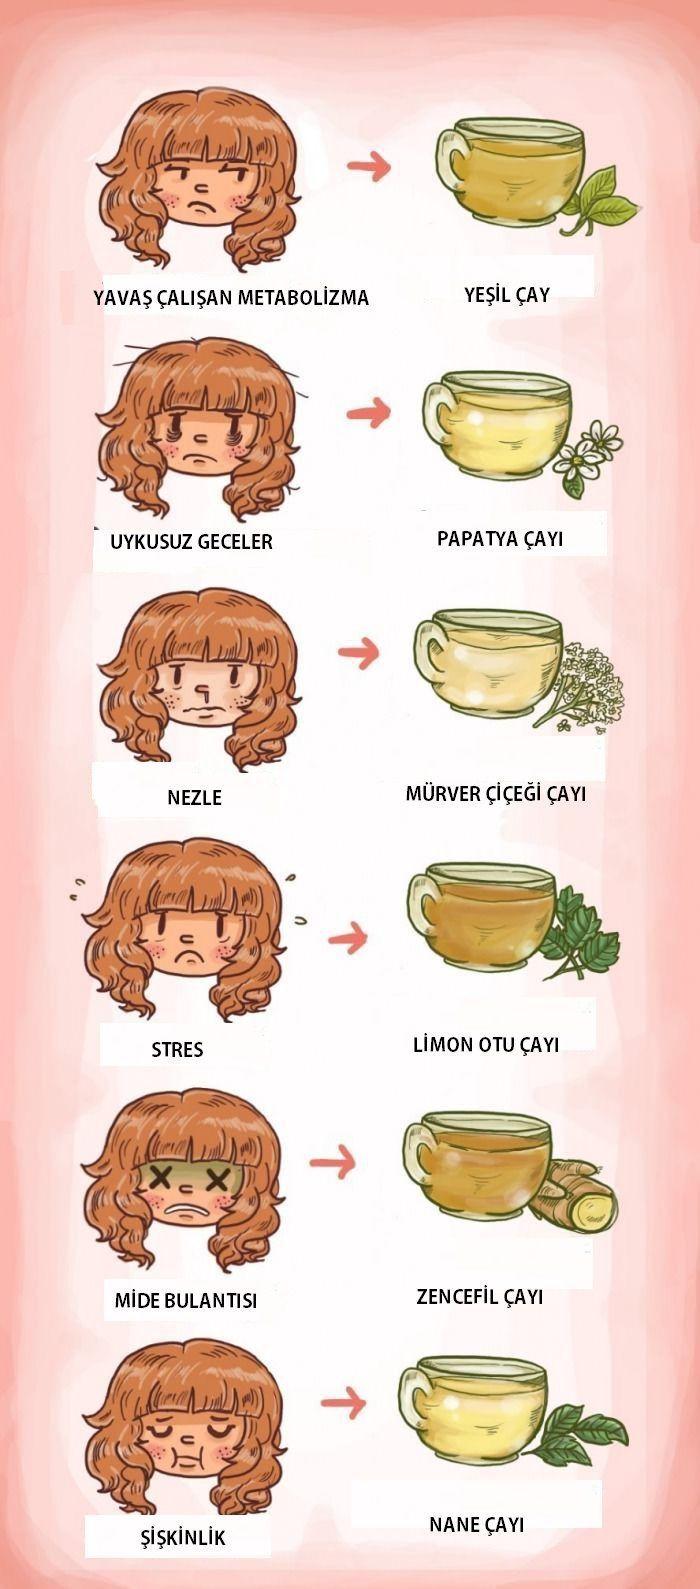 Hangi bitkisel çay hangi rahatsızlığa faydalıdır. #sağlık #sağlıkhaberleri #bitkiselçay #health #tea